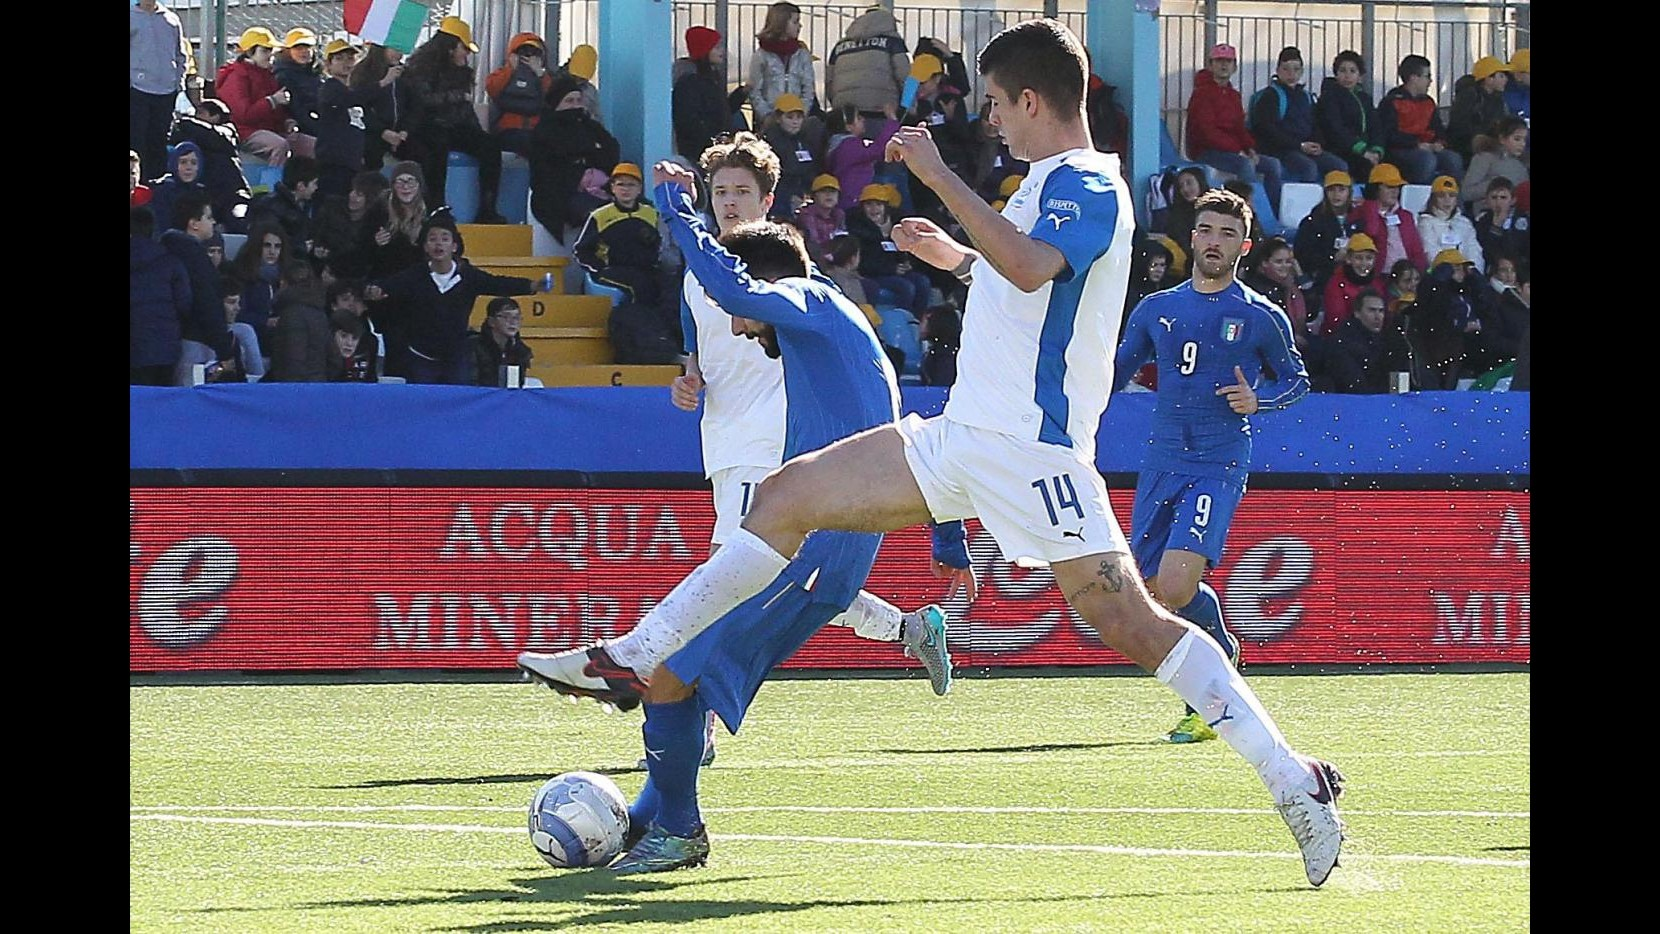 Calcio, Under 21: azzurrini superano 5-2 B Italia a Chiavari